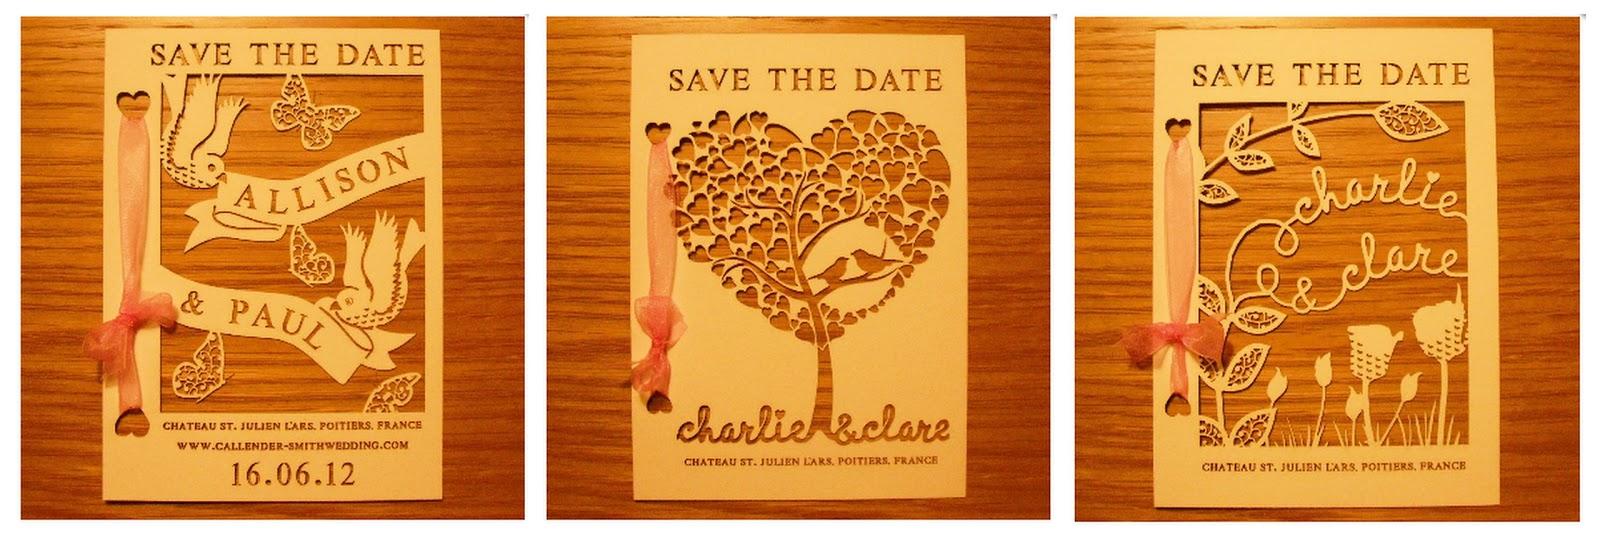 Laser Cut Wedding Invites: Magical Laser-Cut Wedding Invitations